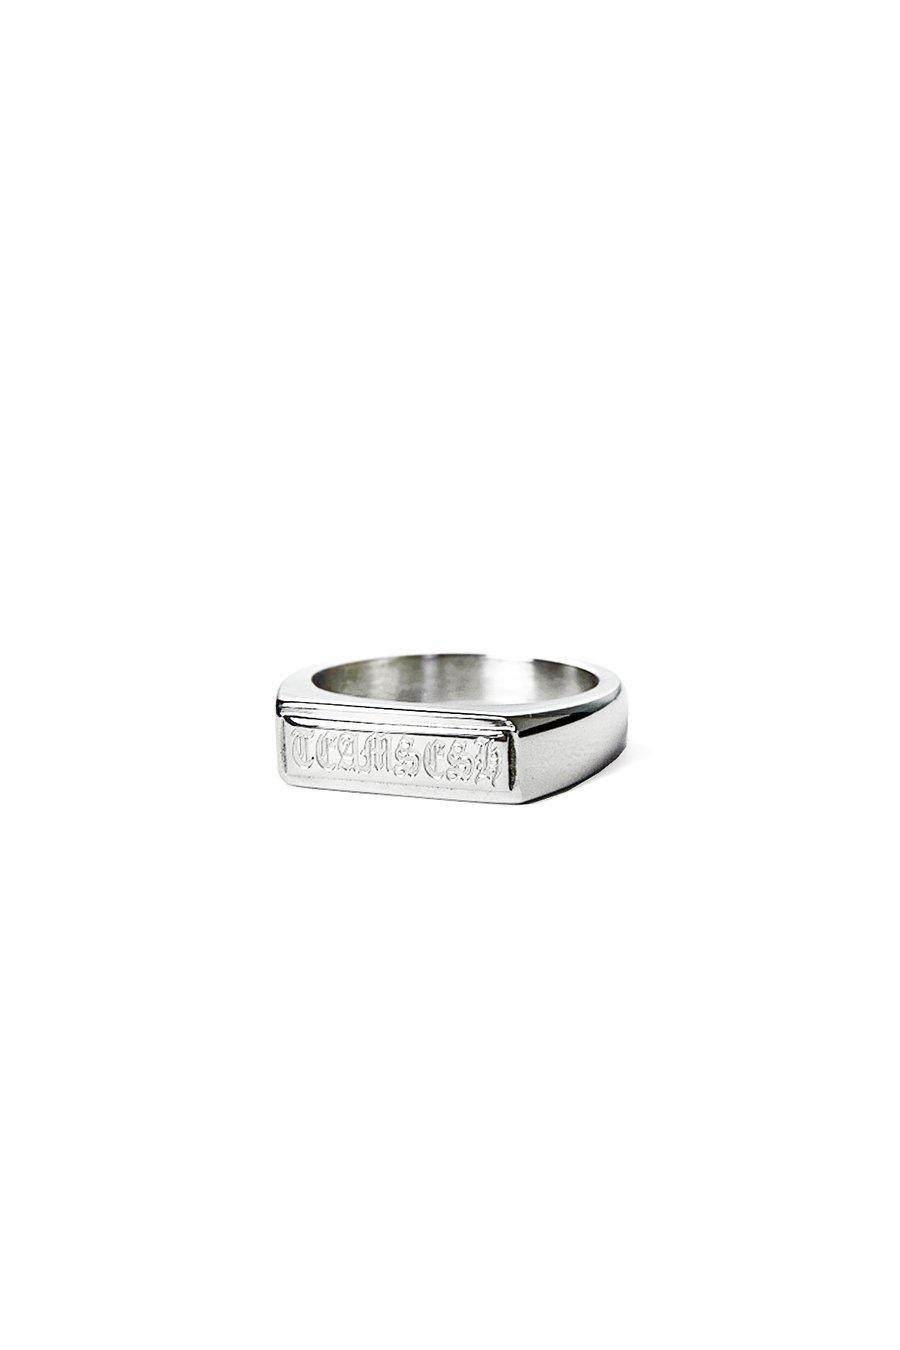 "Image of ""BarLogo"" Ring"